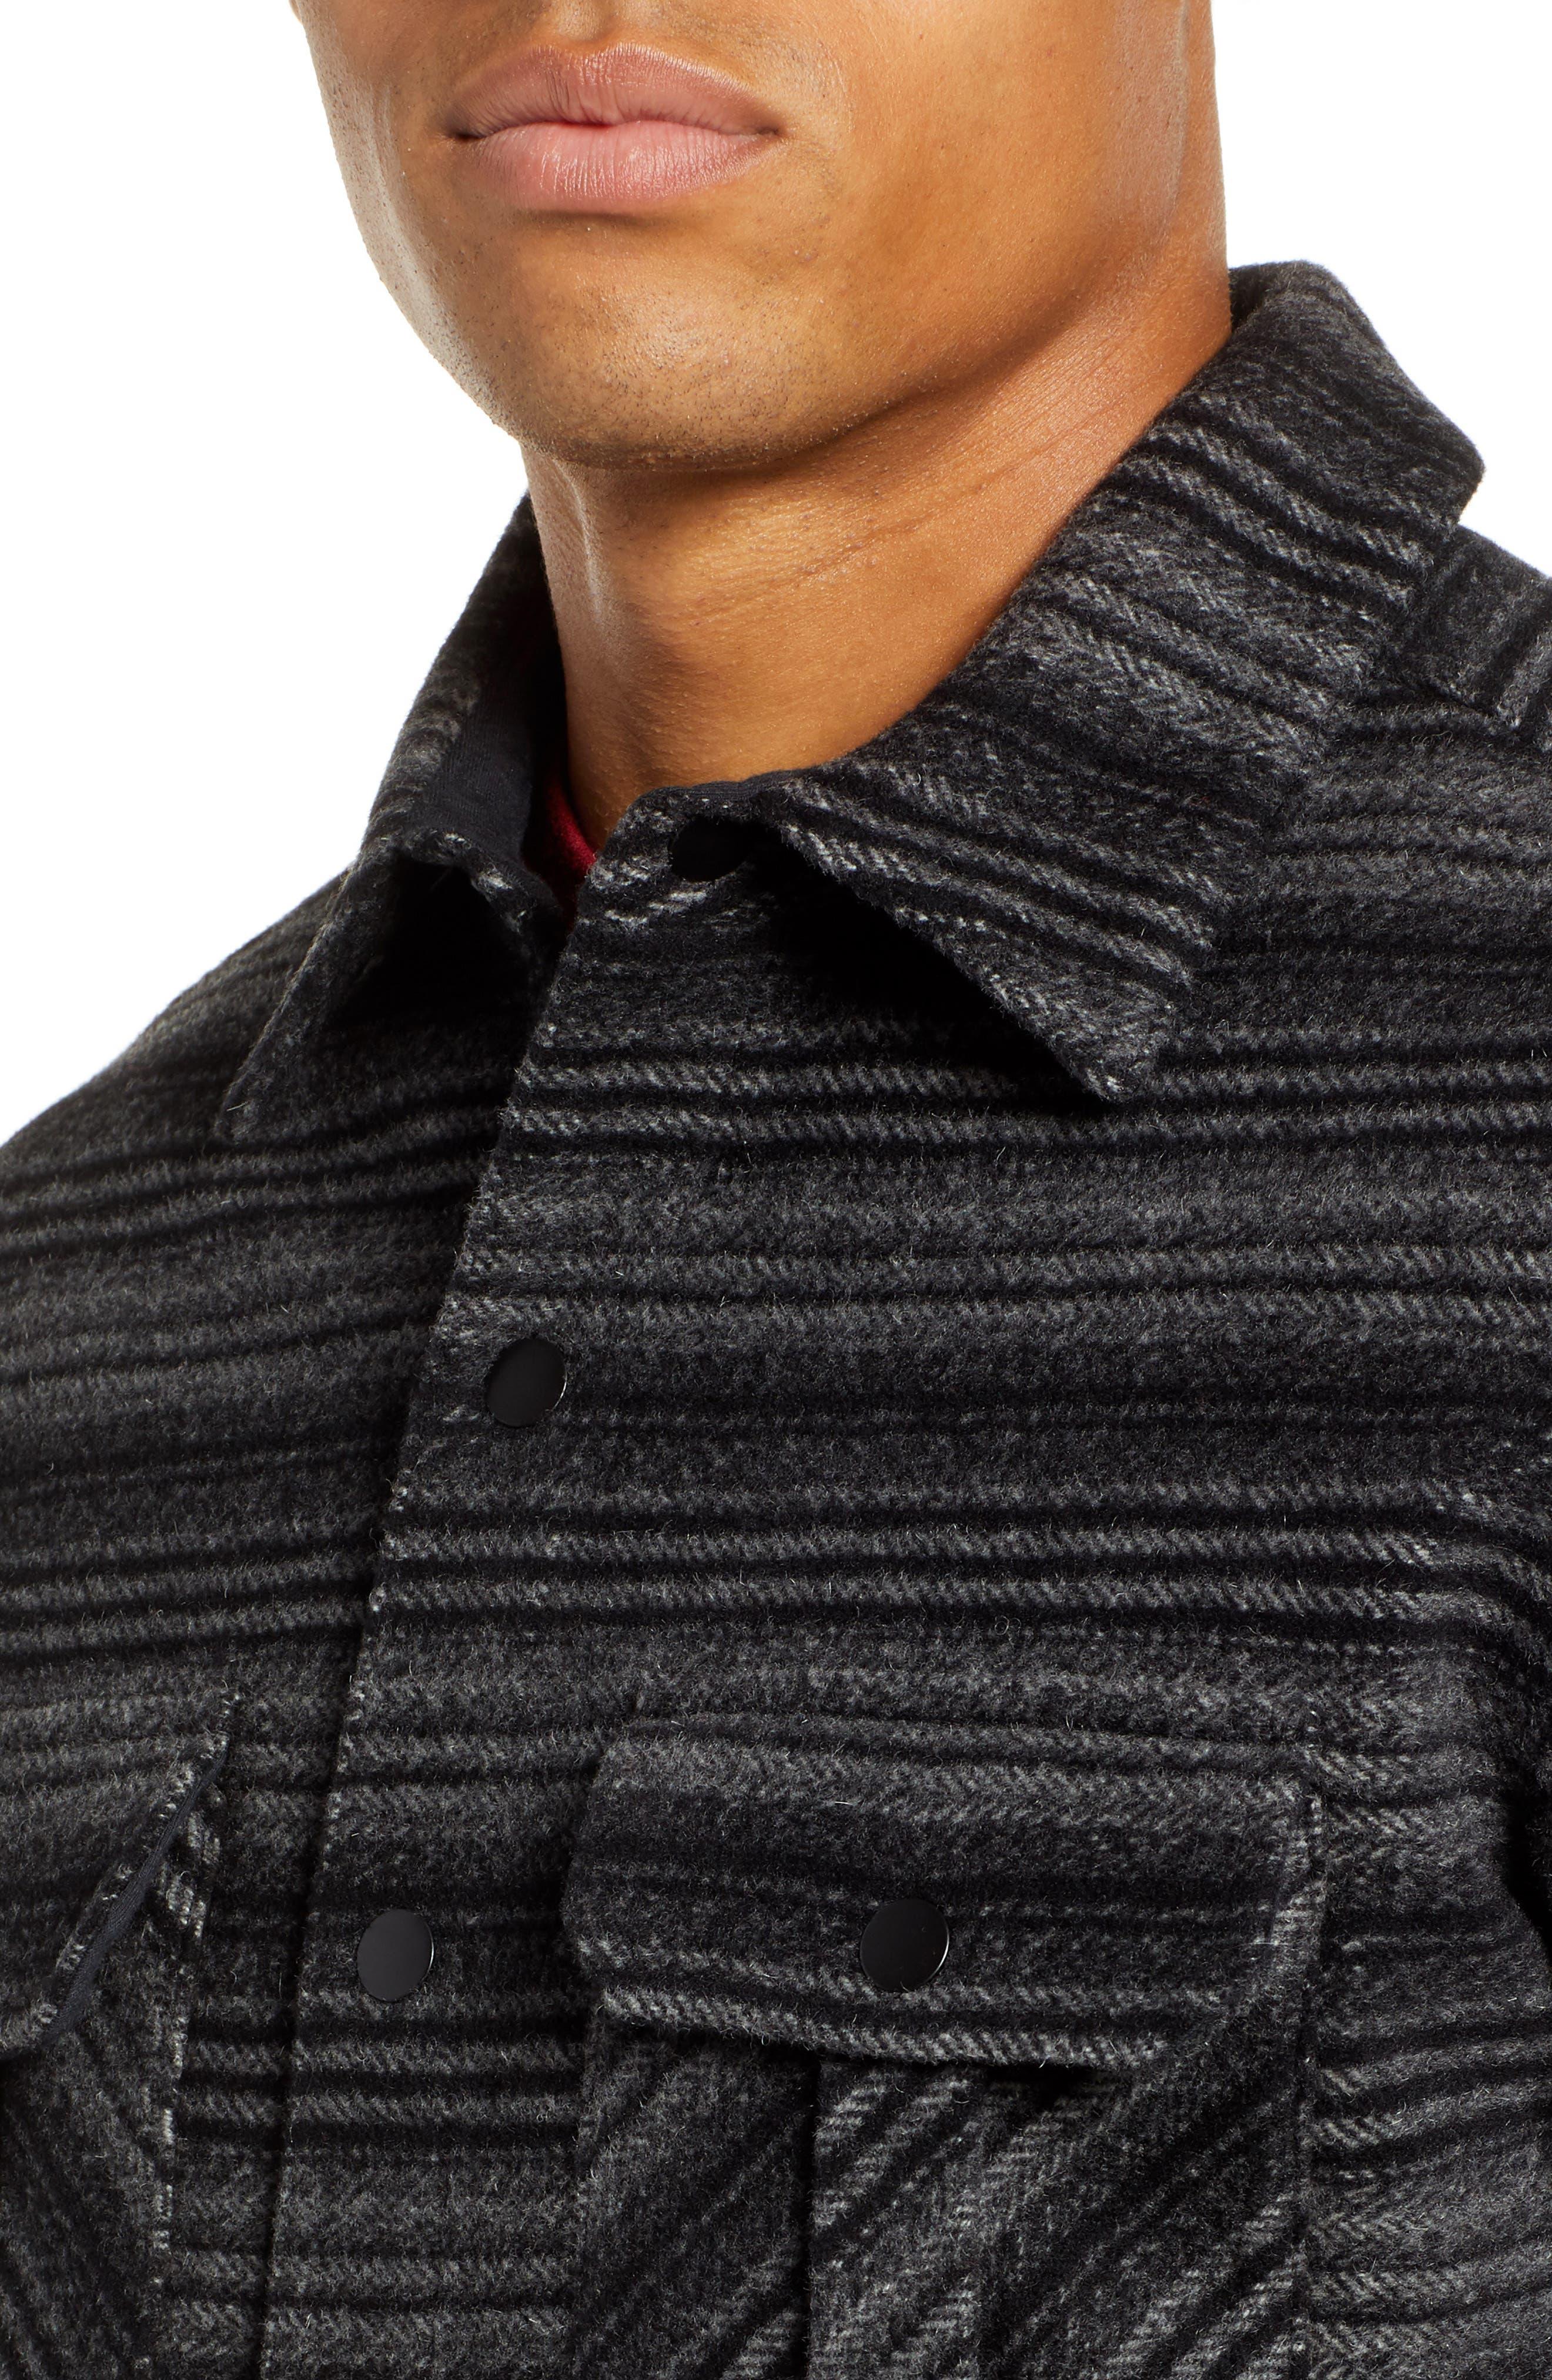 Anchor Line Flannel Shirt Jacket,                             Alternate thumbnail 2, color,                             MEDIUM GREY/ BLACK